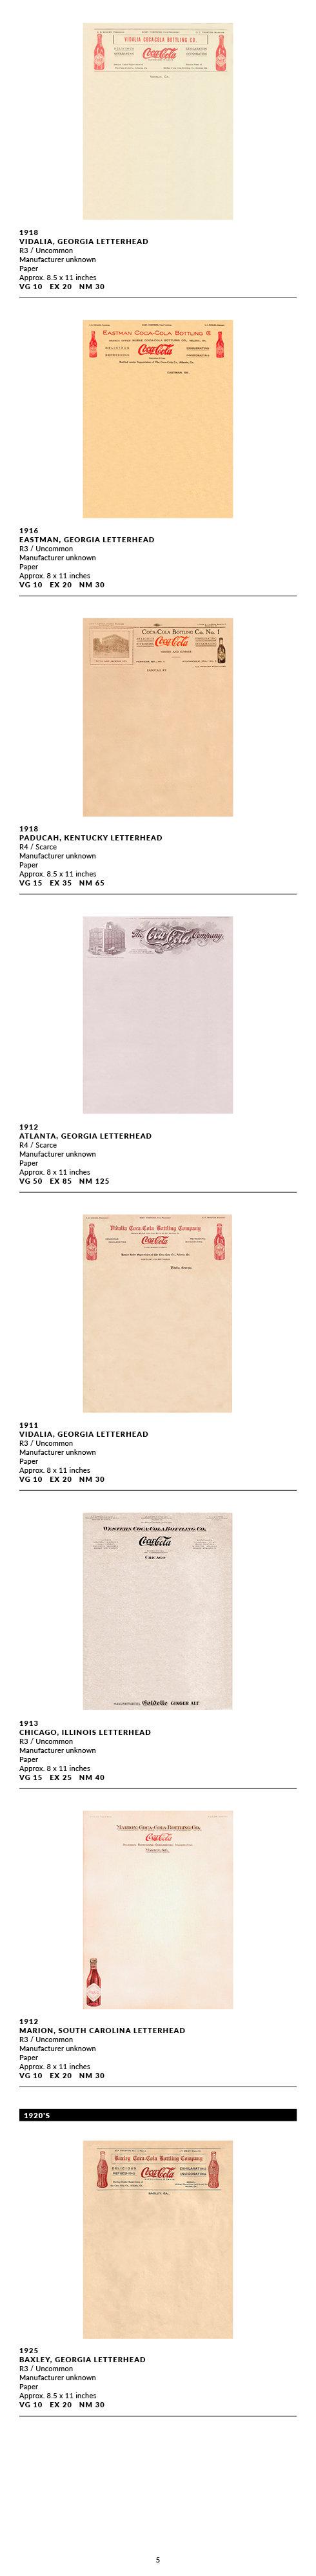 Letterhead5.jpg